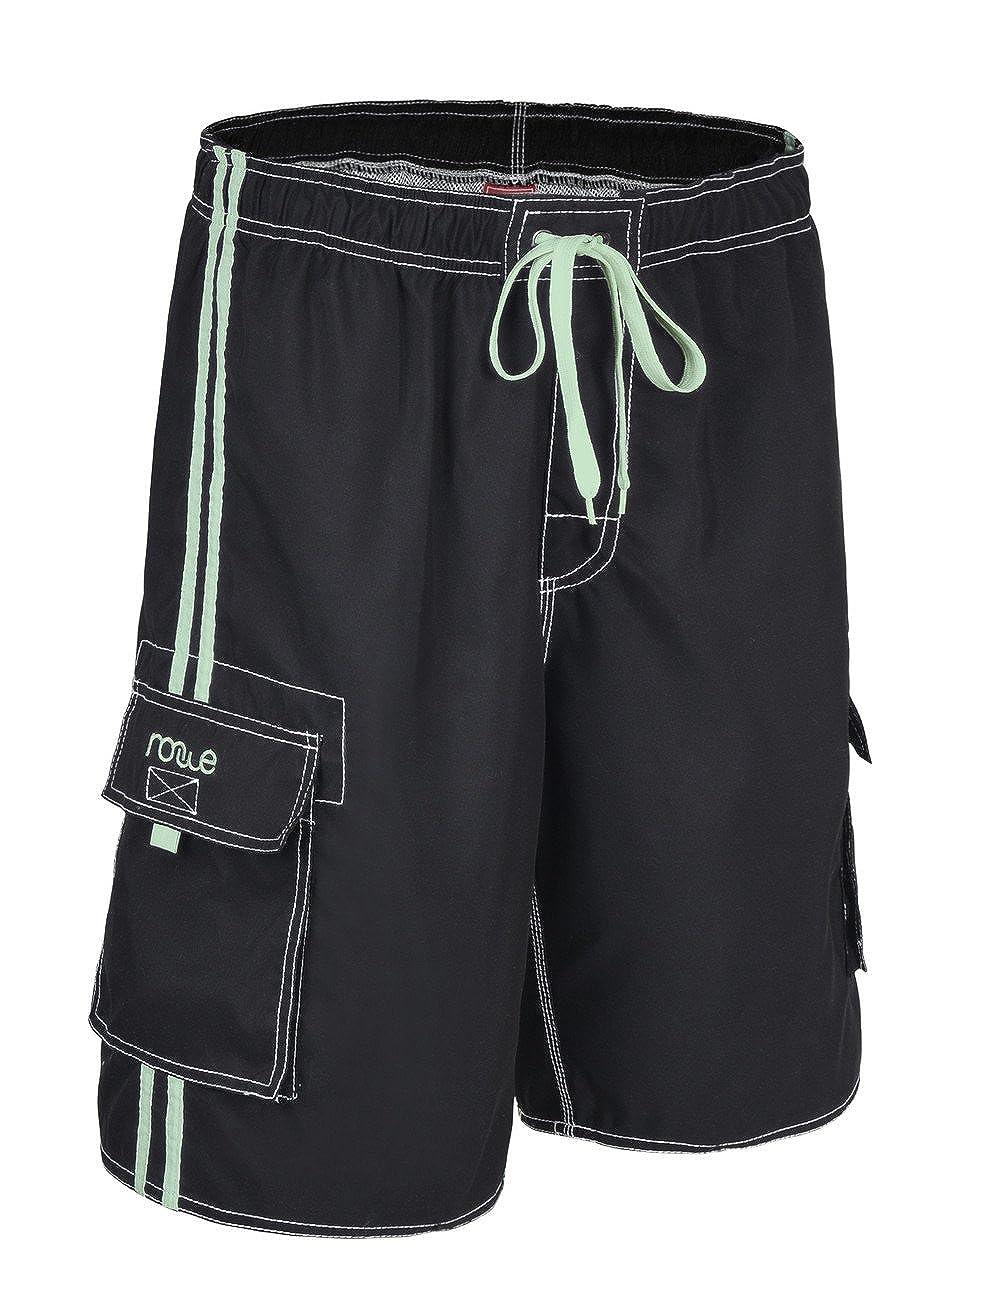 501f0bd7ce Nonwe Men's Beachwear Board Shorts Quick Dry with Mesh Lining Swim Trunks |  Amazon.com